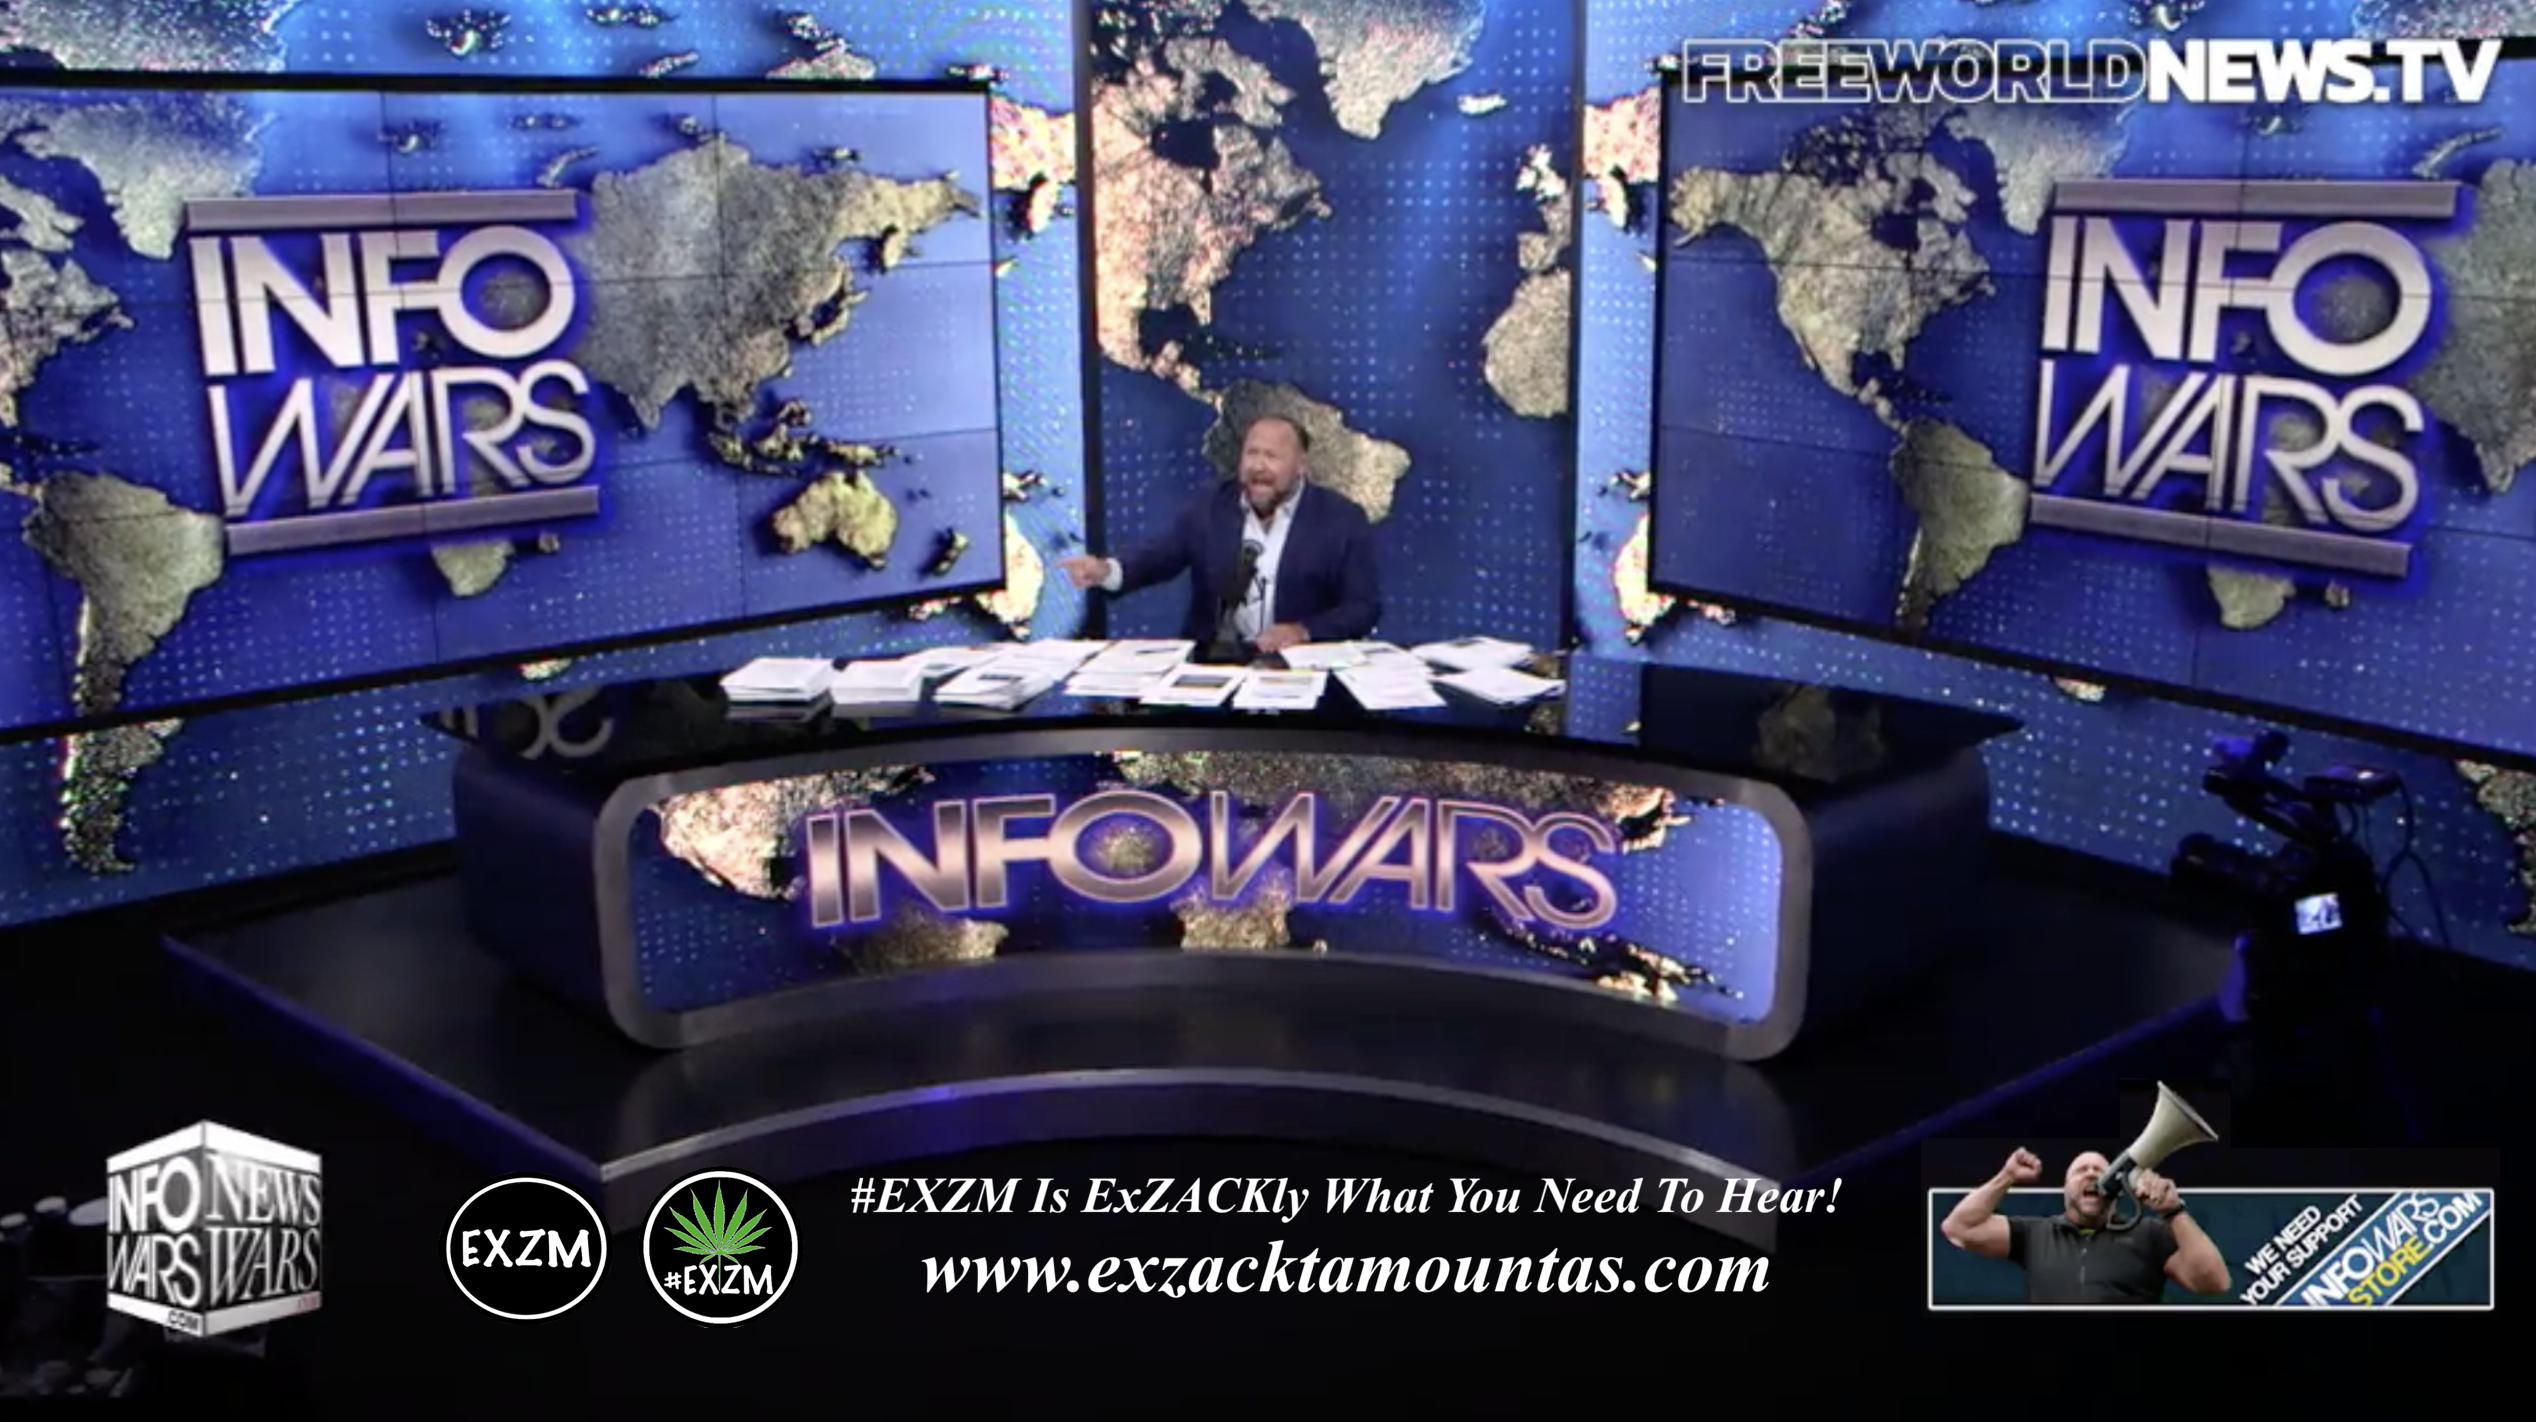 Alex Jones Live In Infowars Studio Free World News TV EXZM Zack Mount September 9th 2021 copy